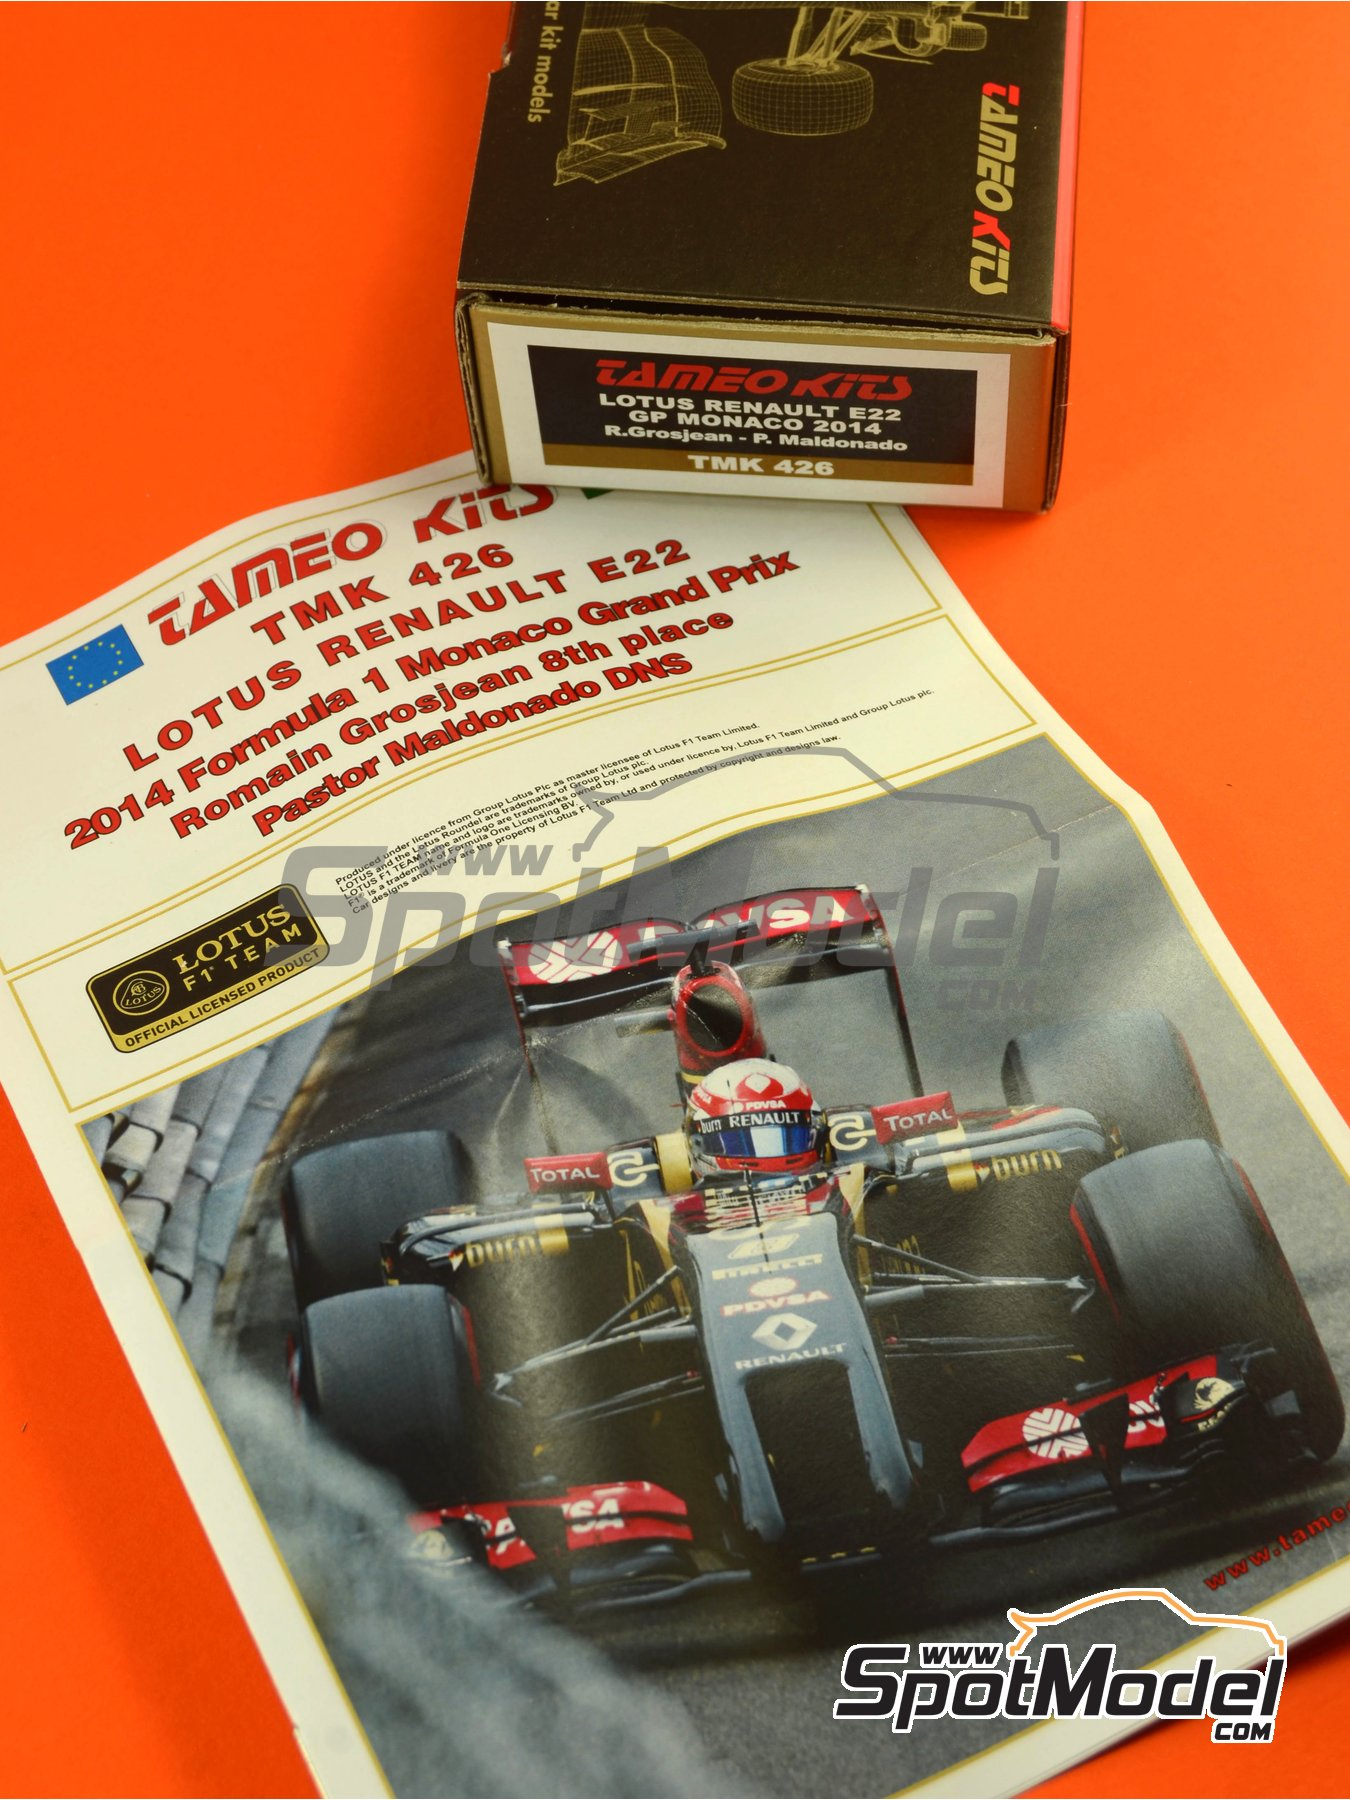 Lotus Renault E22 Rexona - Gran Premio de Formula 1 de Mónaco 2014 | Maqueta de coche en escala1/43 fabricado por Tameo Kits (ref.TMK426) image